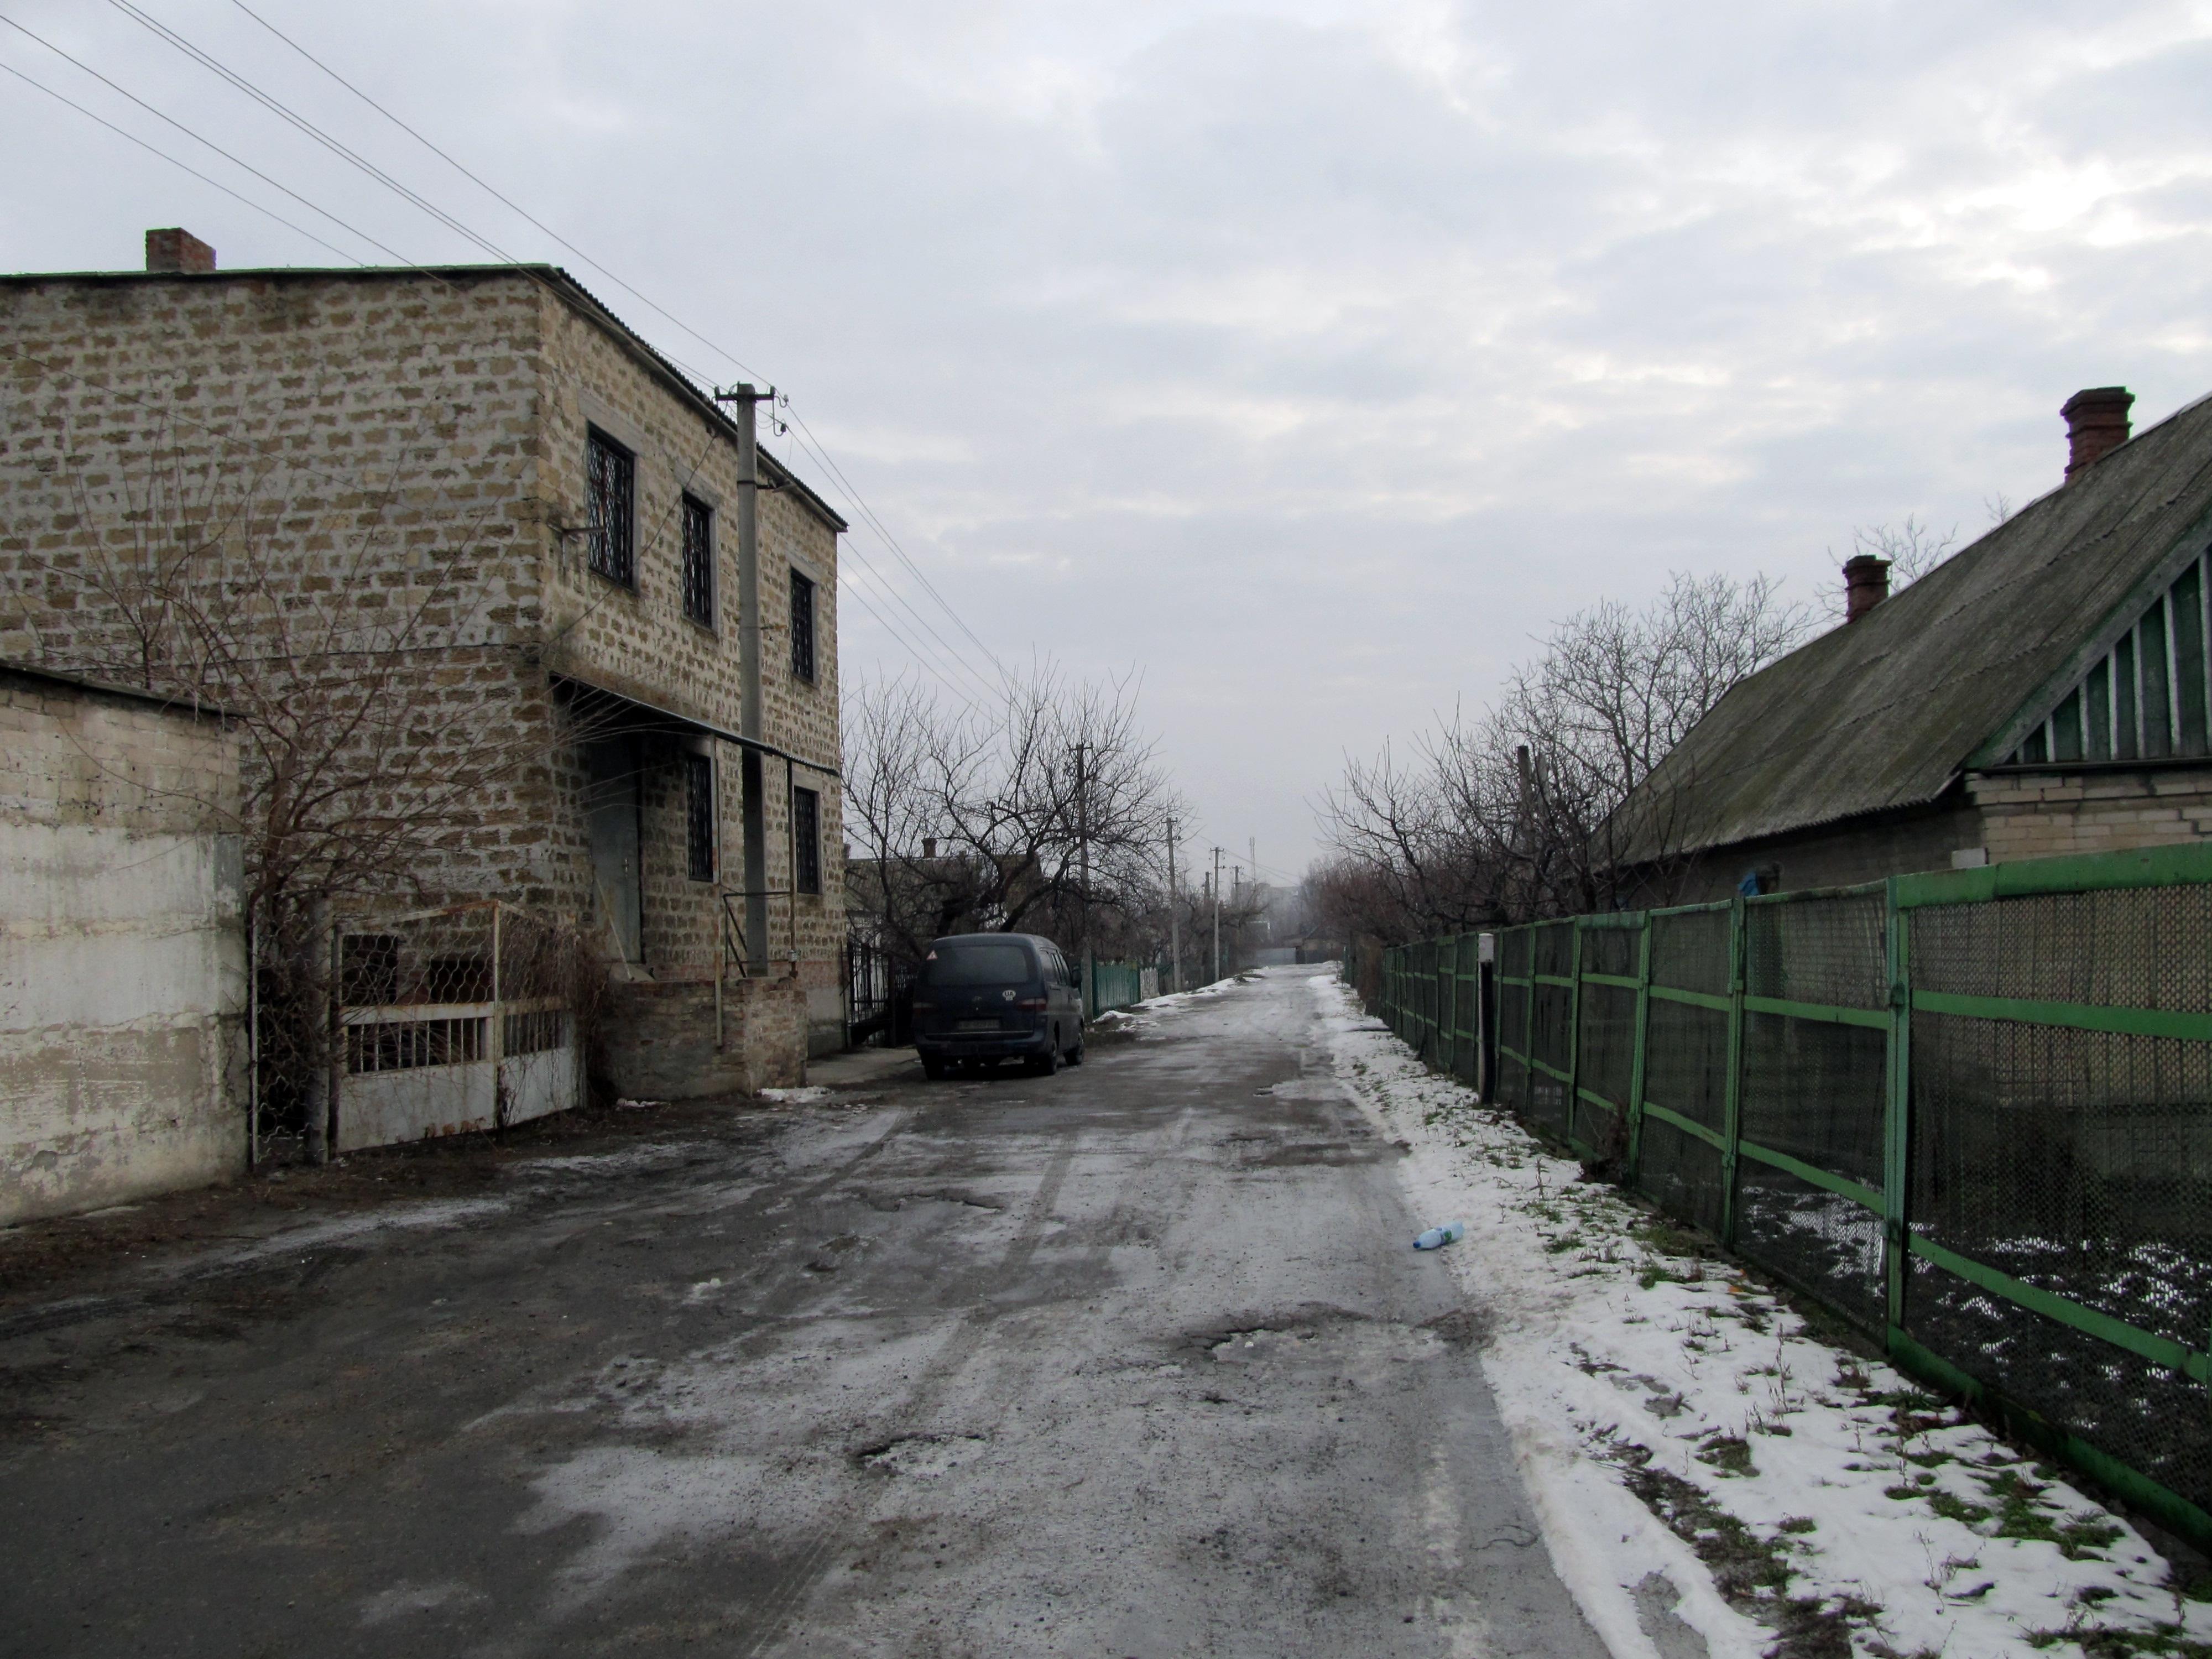 Pervyy Frunze Ln., Melitopol, Zaporizhia Oblast, Ukraine 1.JPG